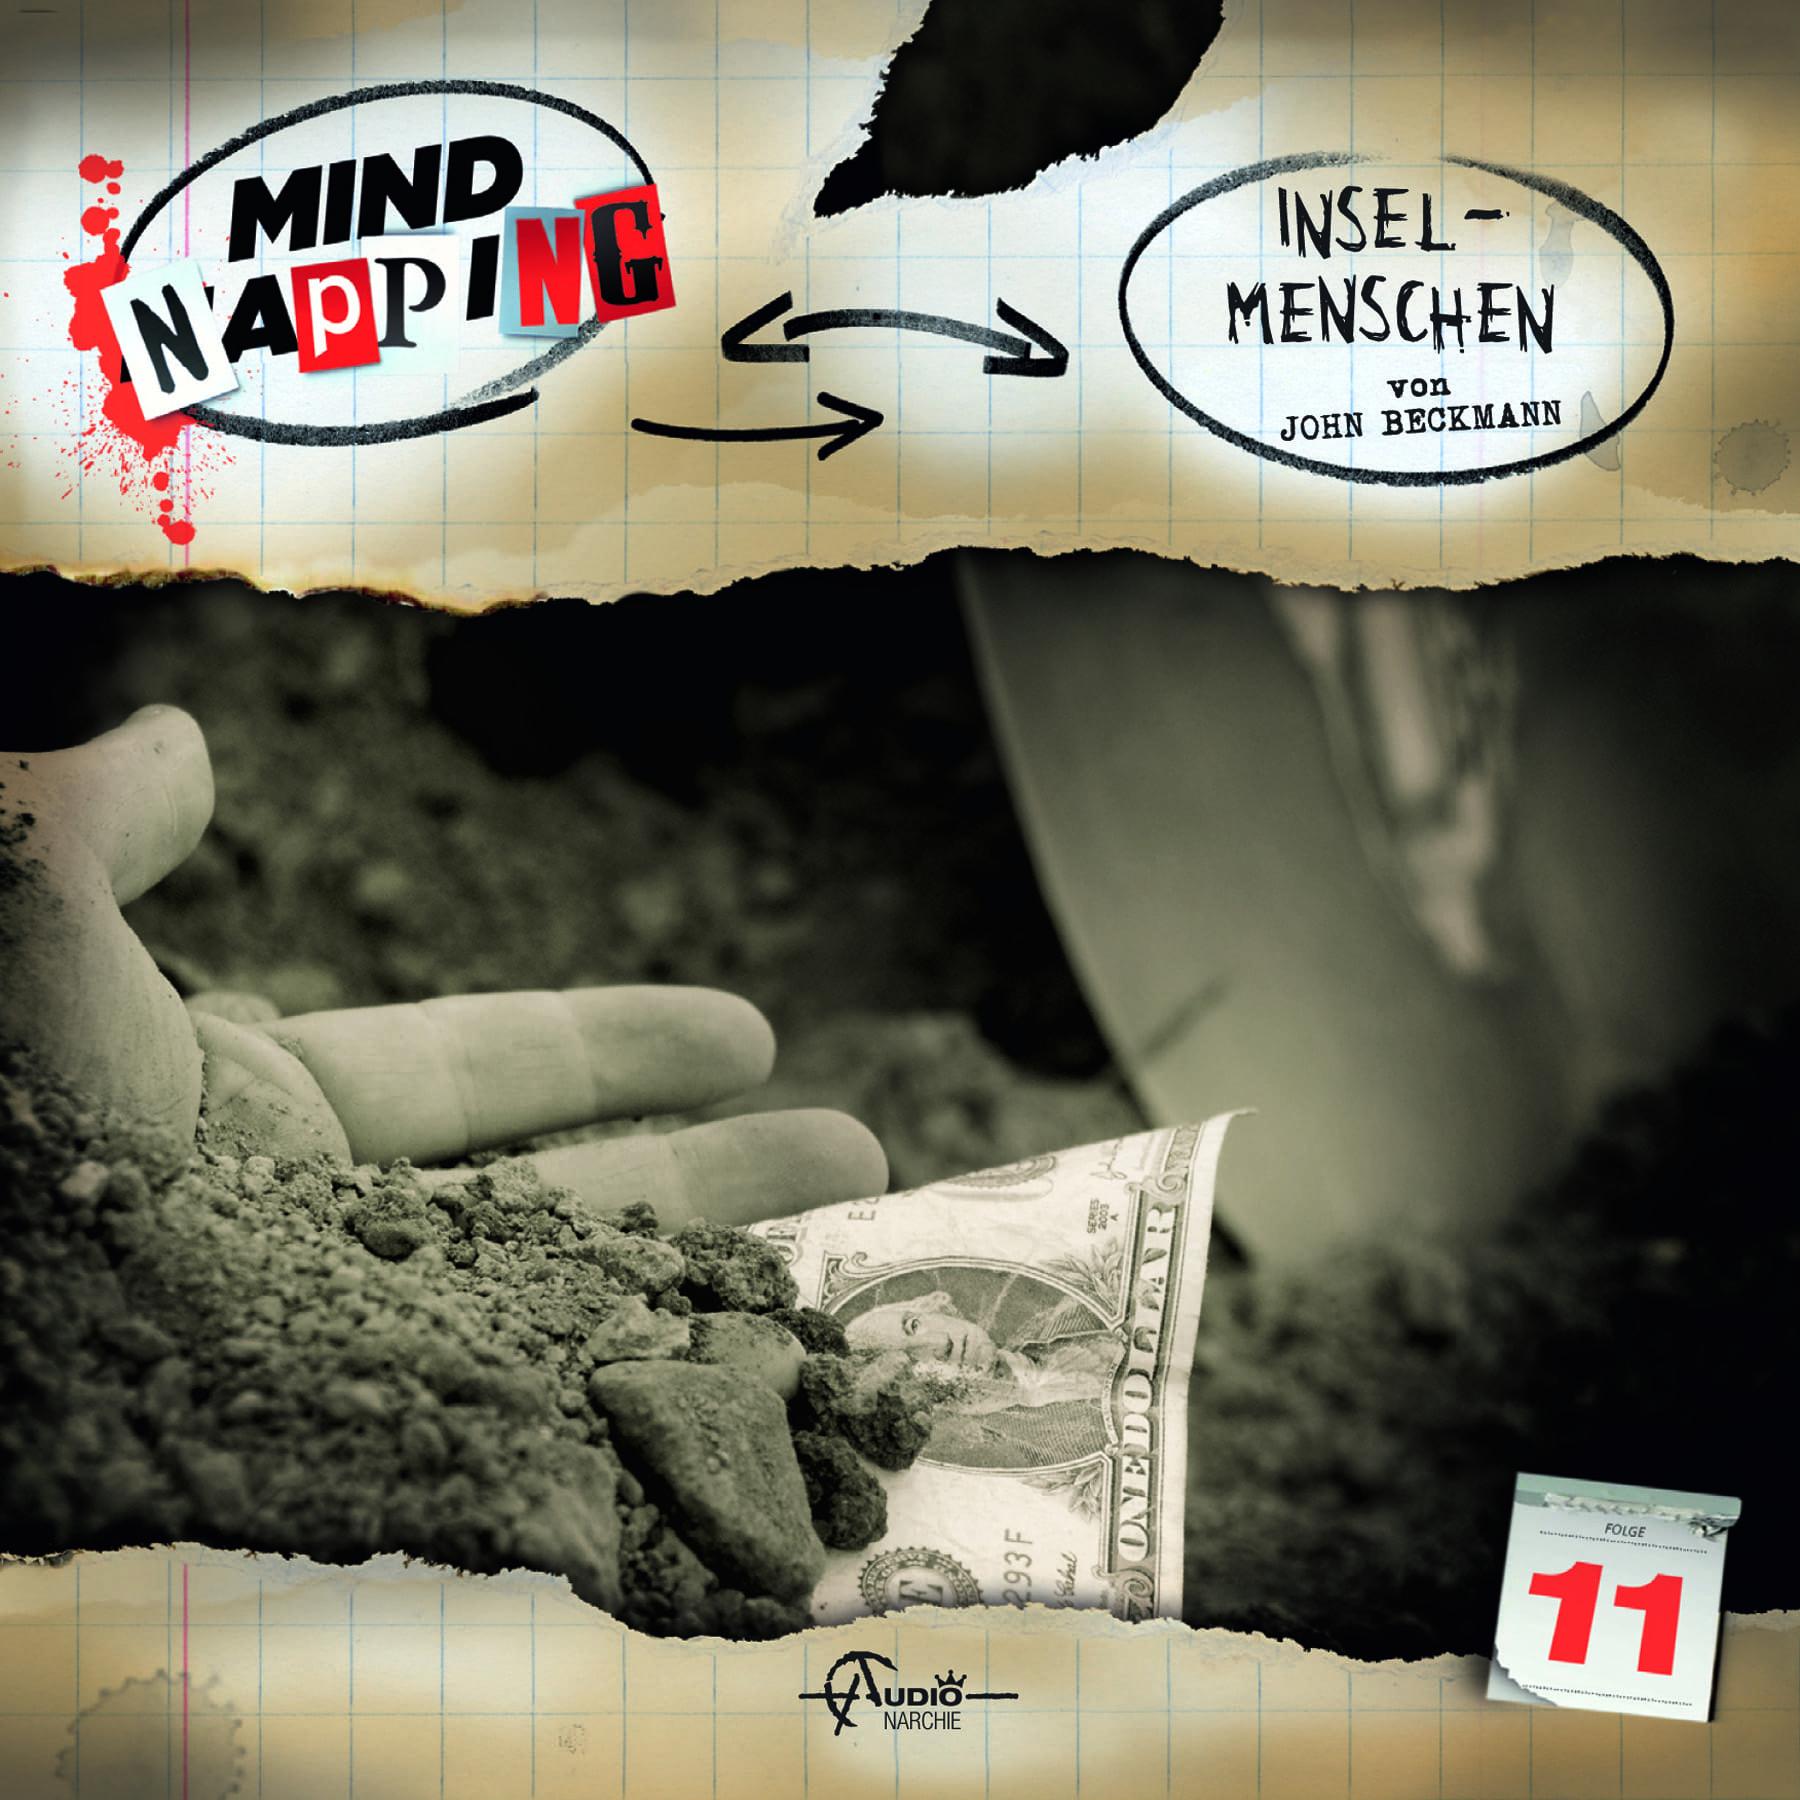 Mindnapping (11) – Insel-Menschen